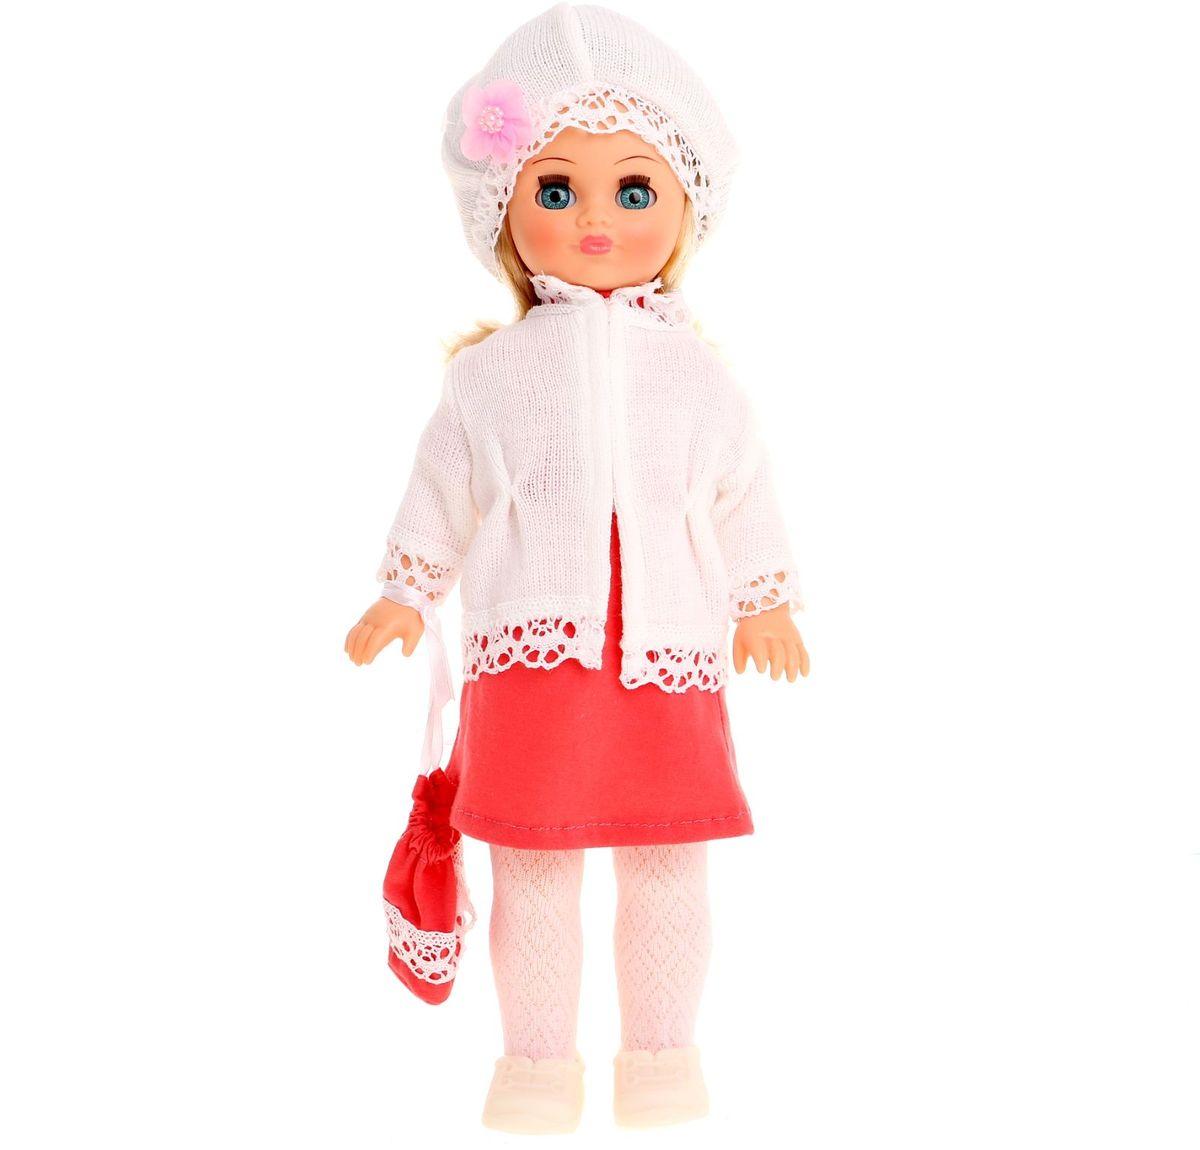 Sima-land Кукла озвученная Лиза 42 см 1163195 кукла весна маргарита 11 озвученная